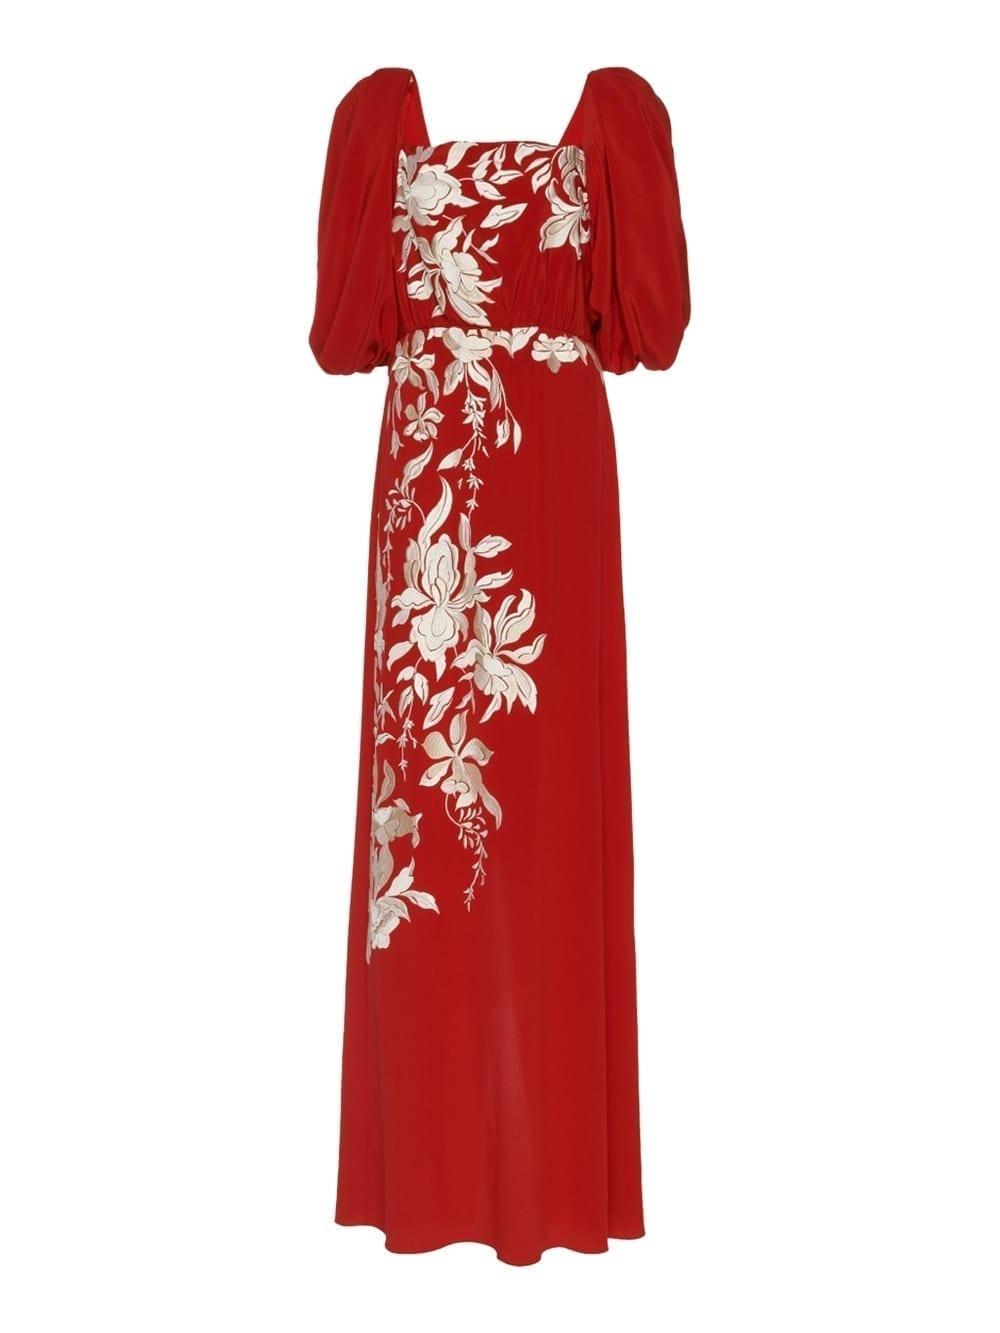 JOHANNA ORTIZ Floral Themes Embroidered Silk Maxi Dress